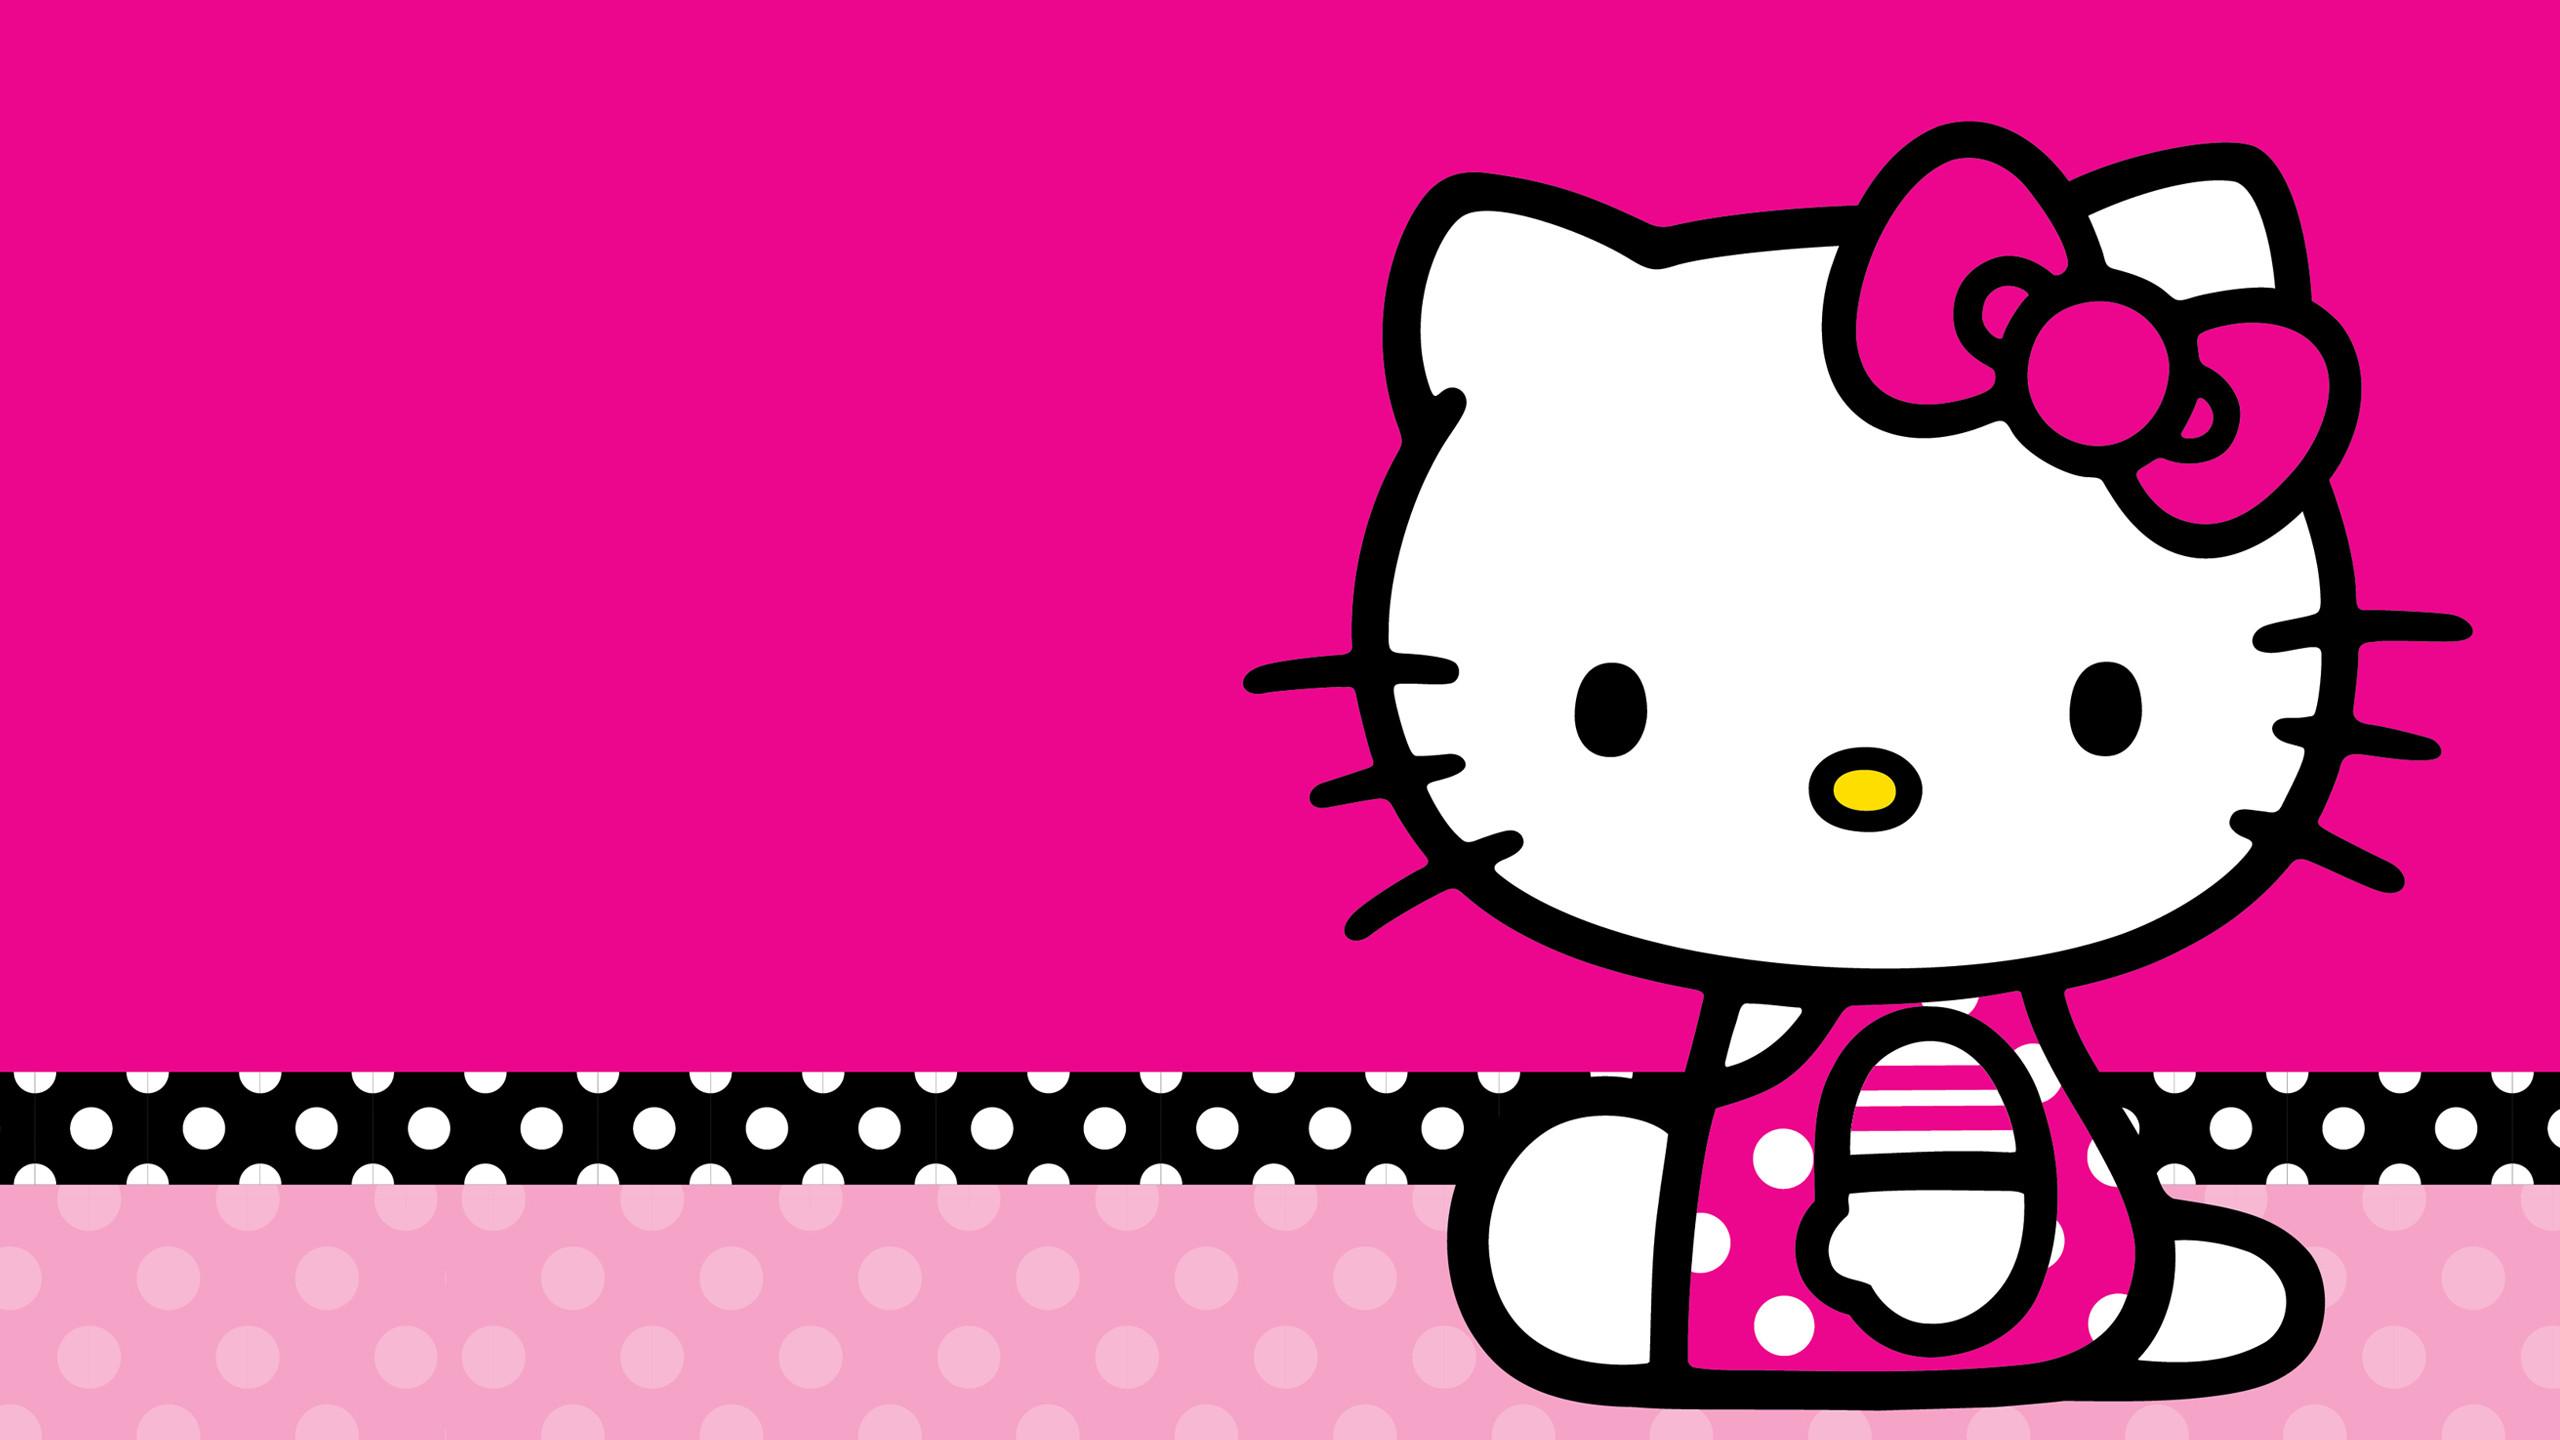 Hello Kitty Wallpapers 2018 1